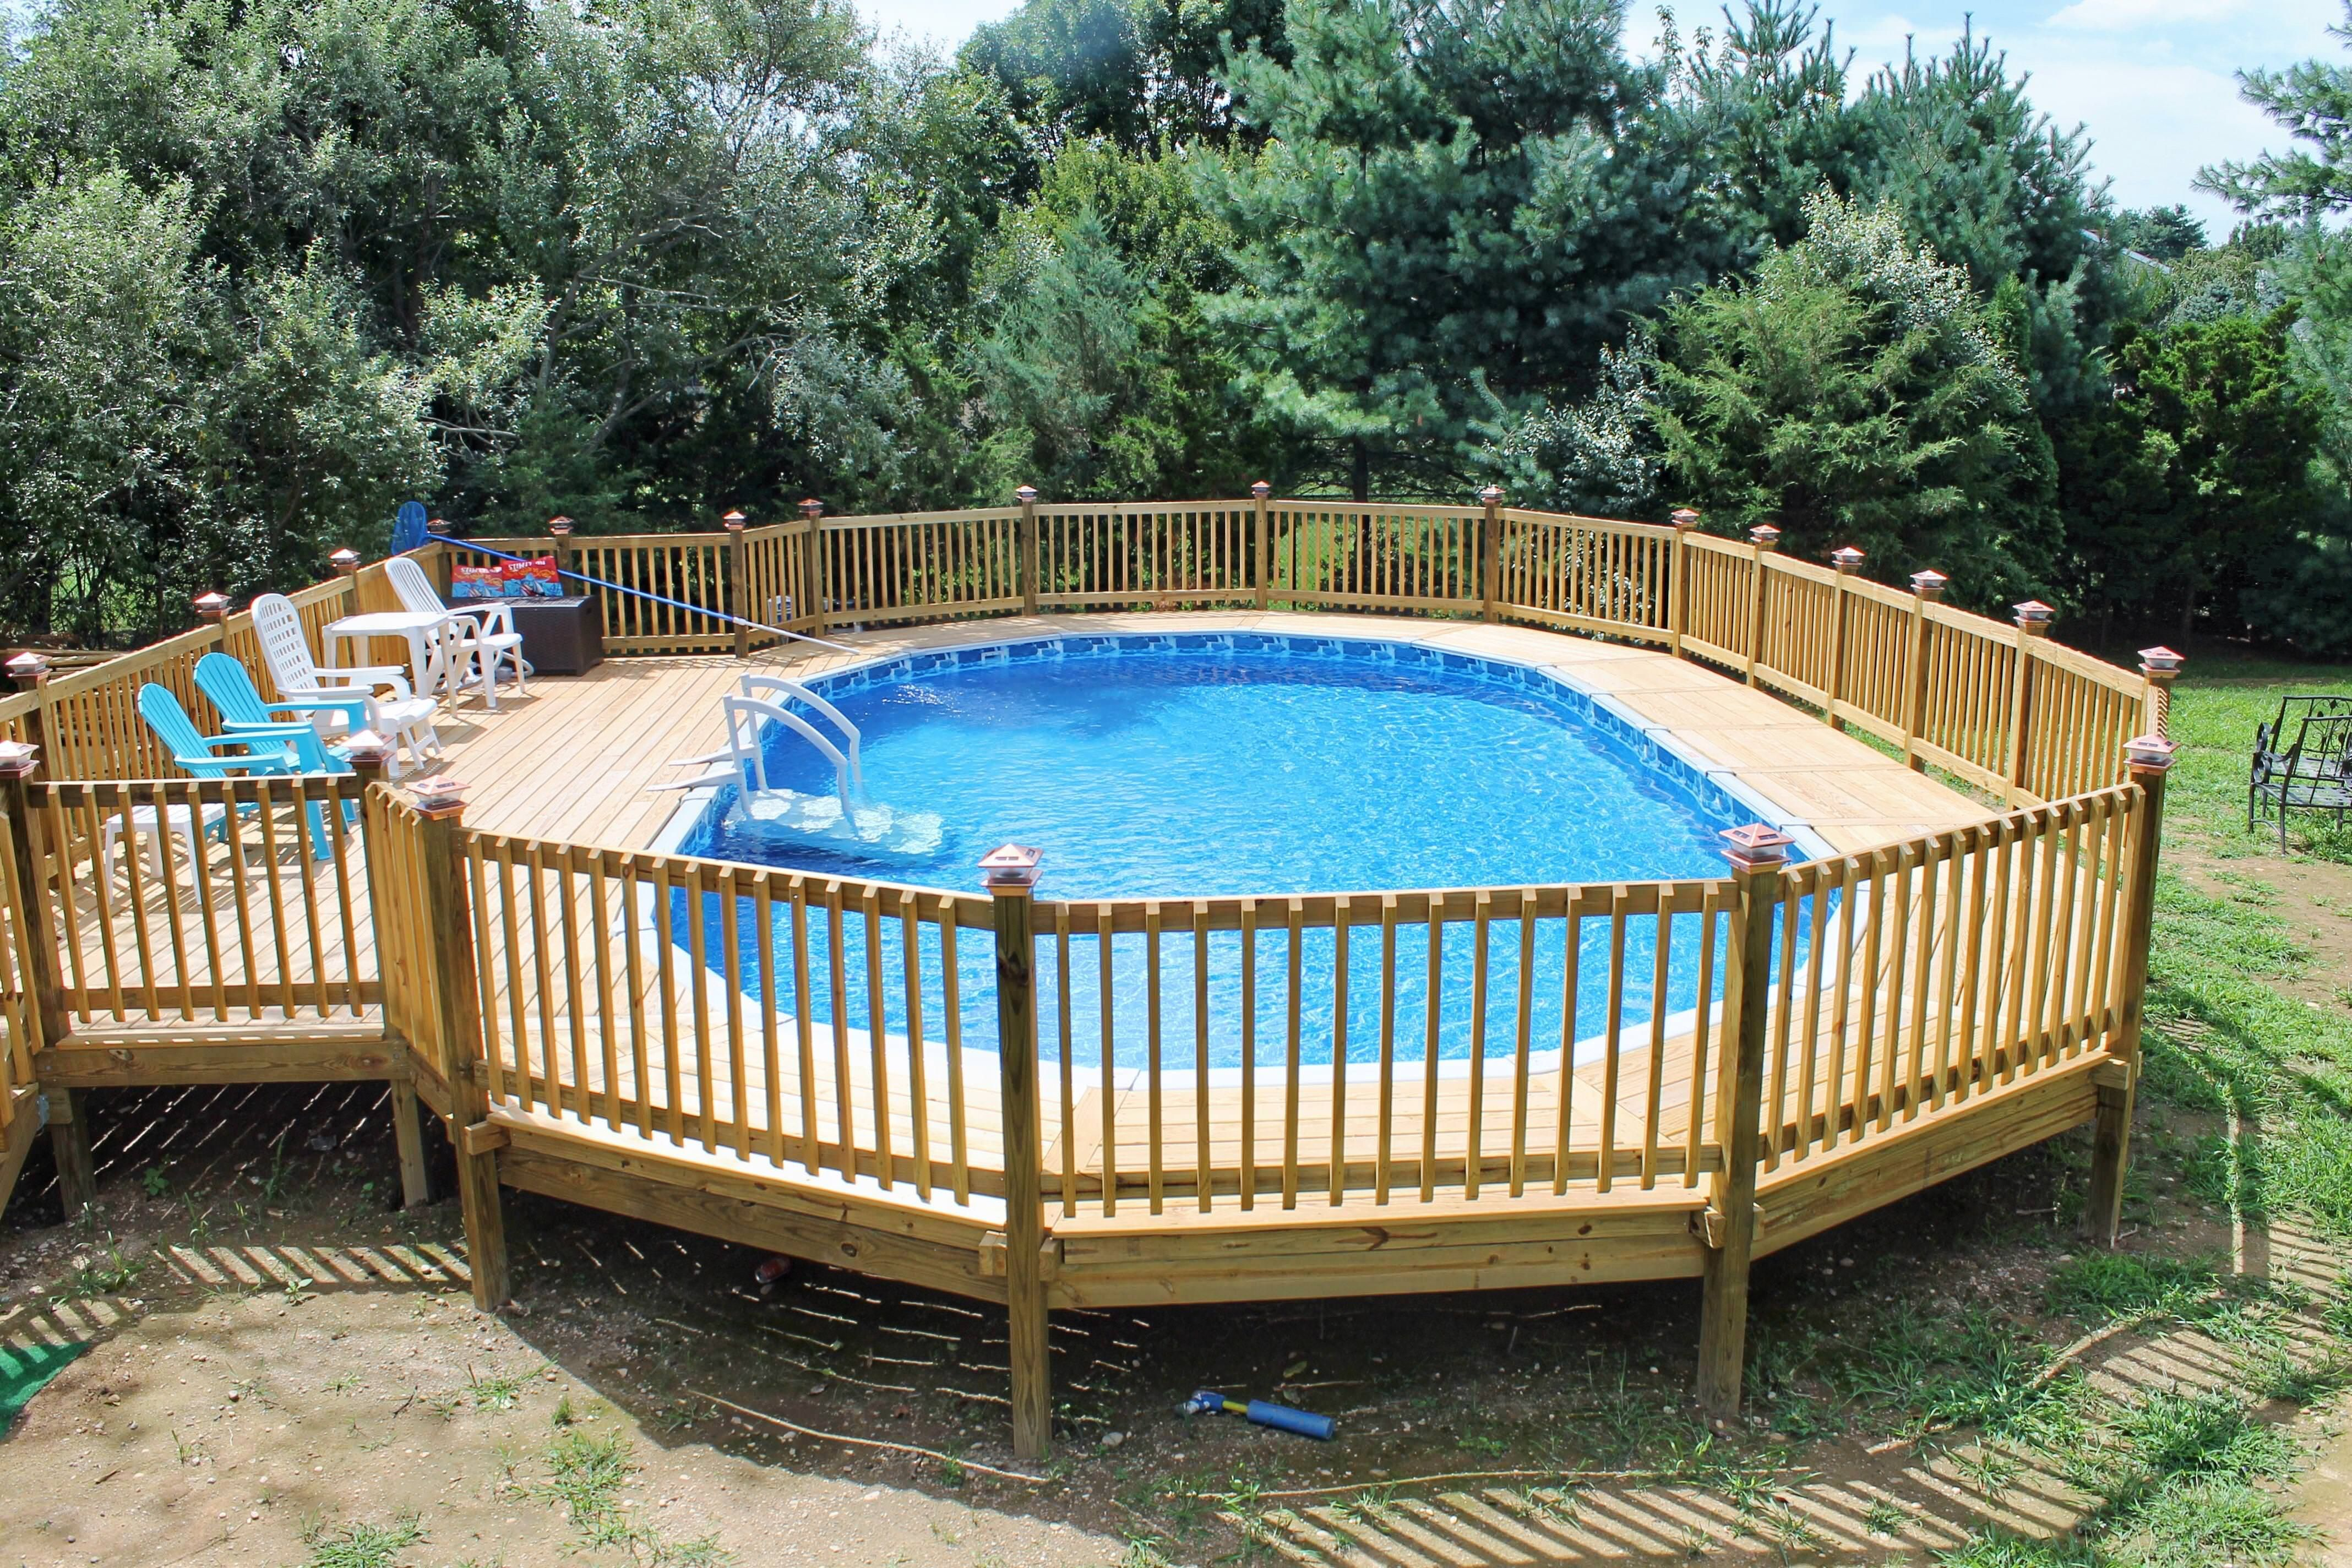 swimming pool decks. C3326c9c616f2c17e222a239248fbdb9.jpg (4272×2848) Swimming Pool Decks 0